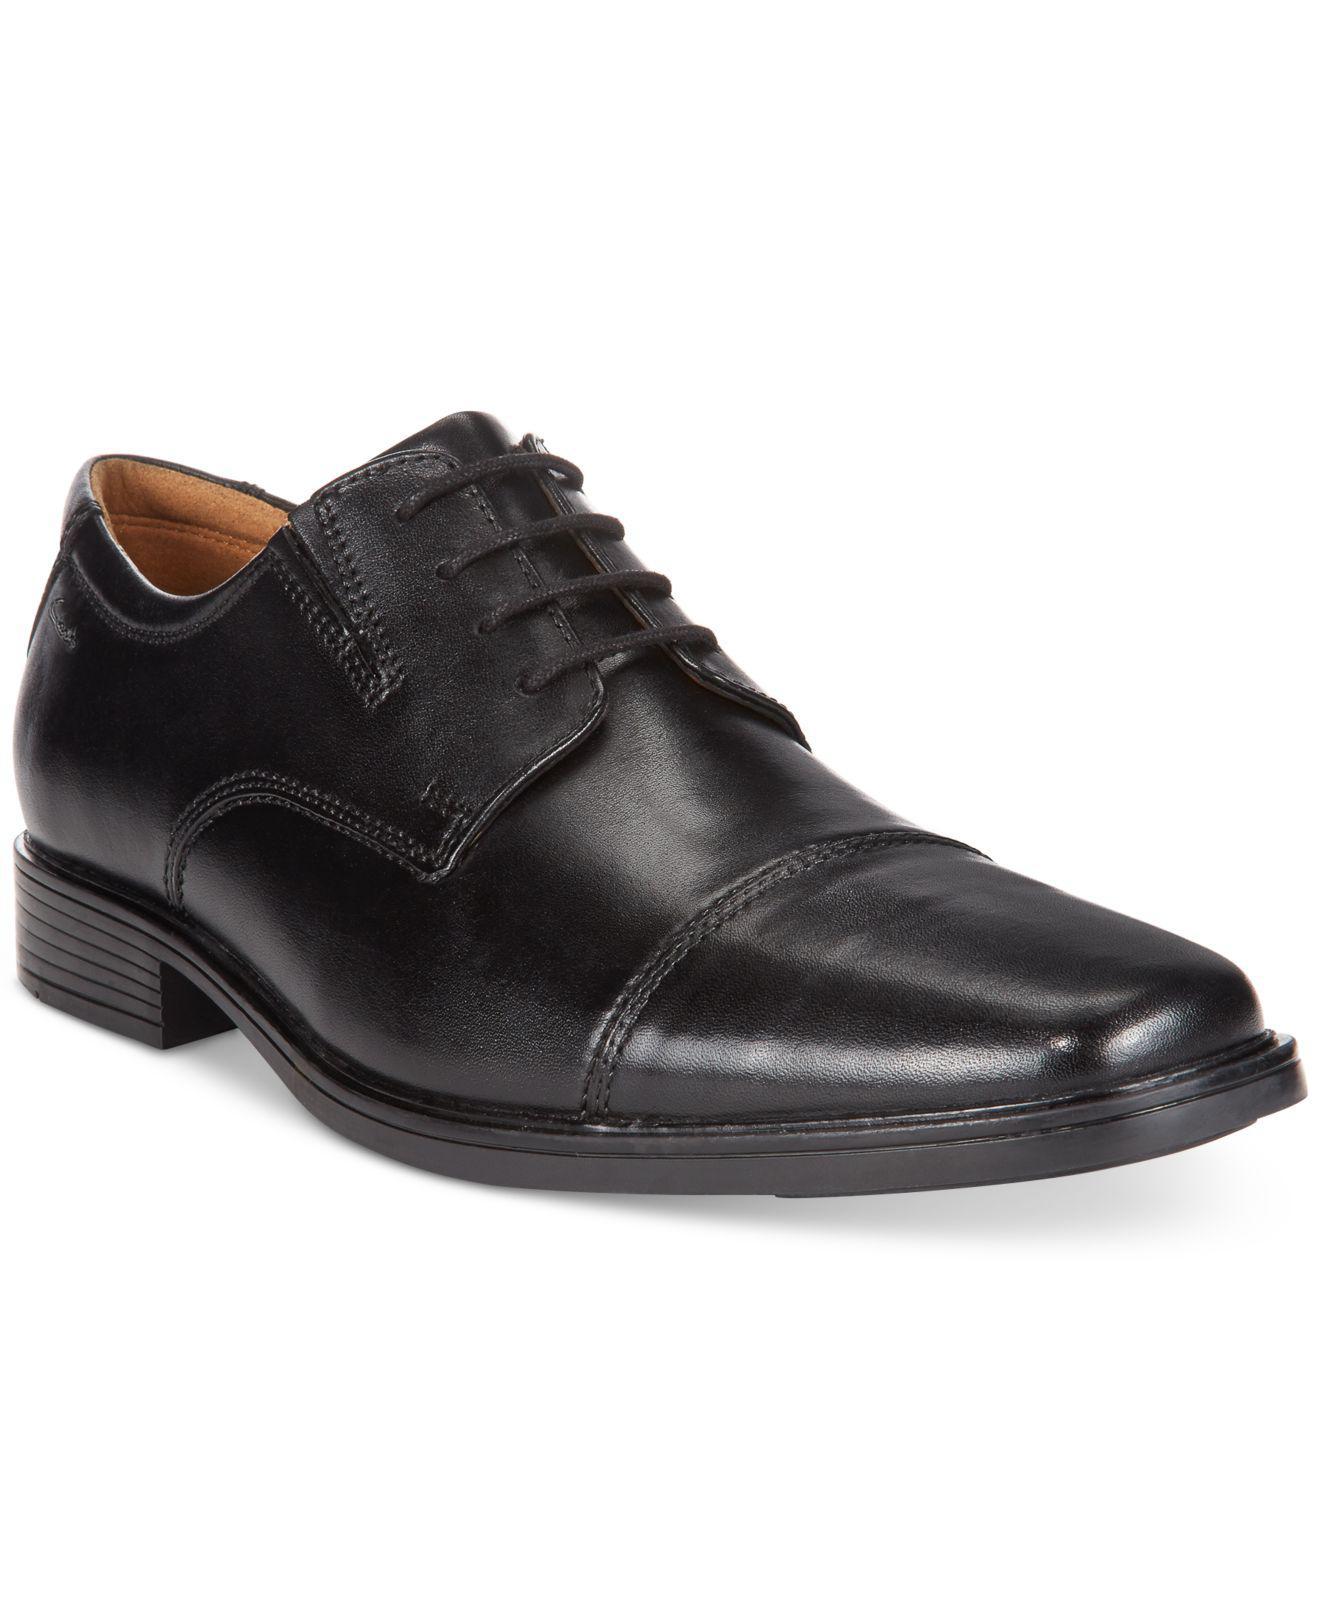 Macy S New York Shoes Men